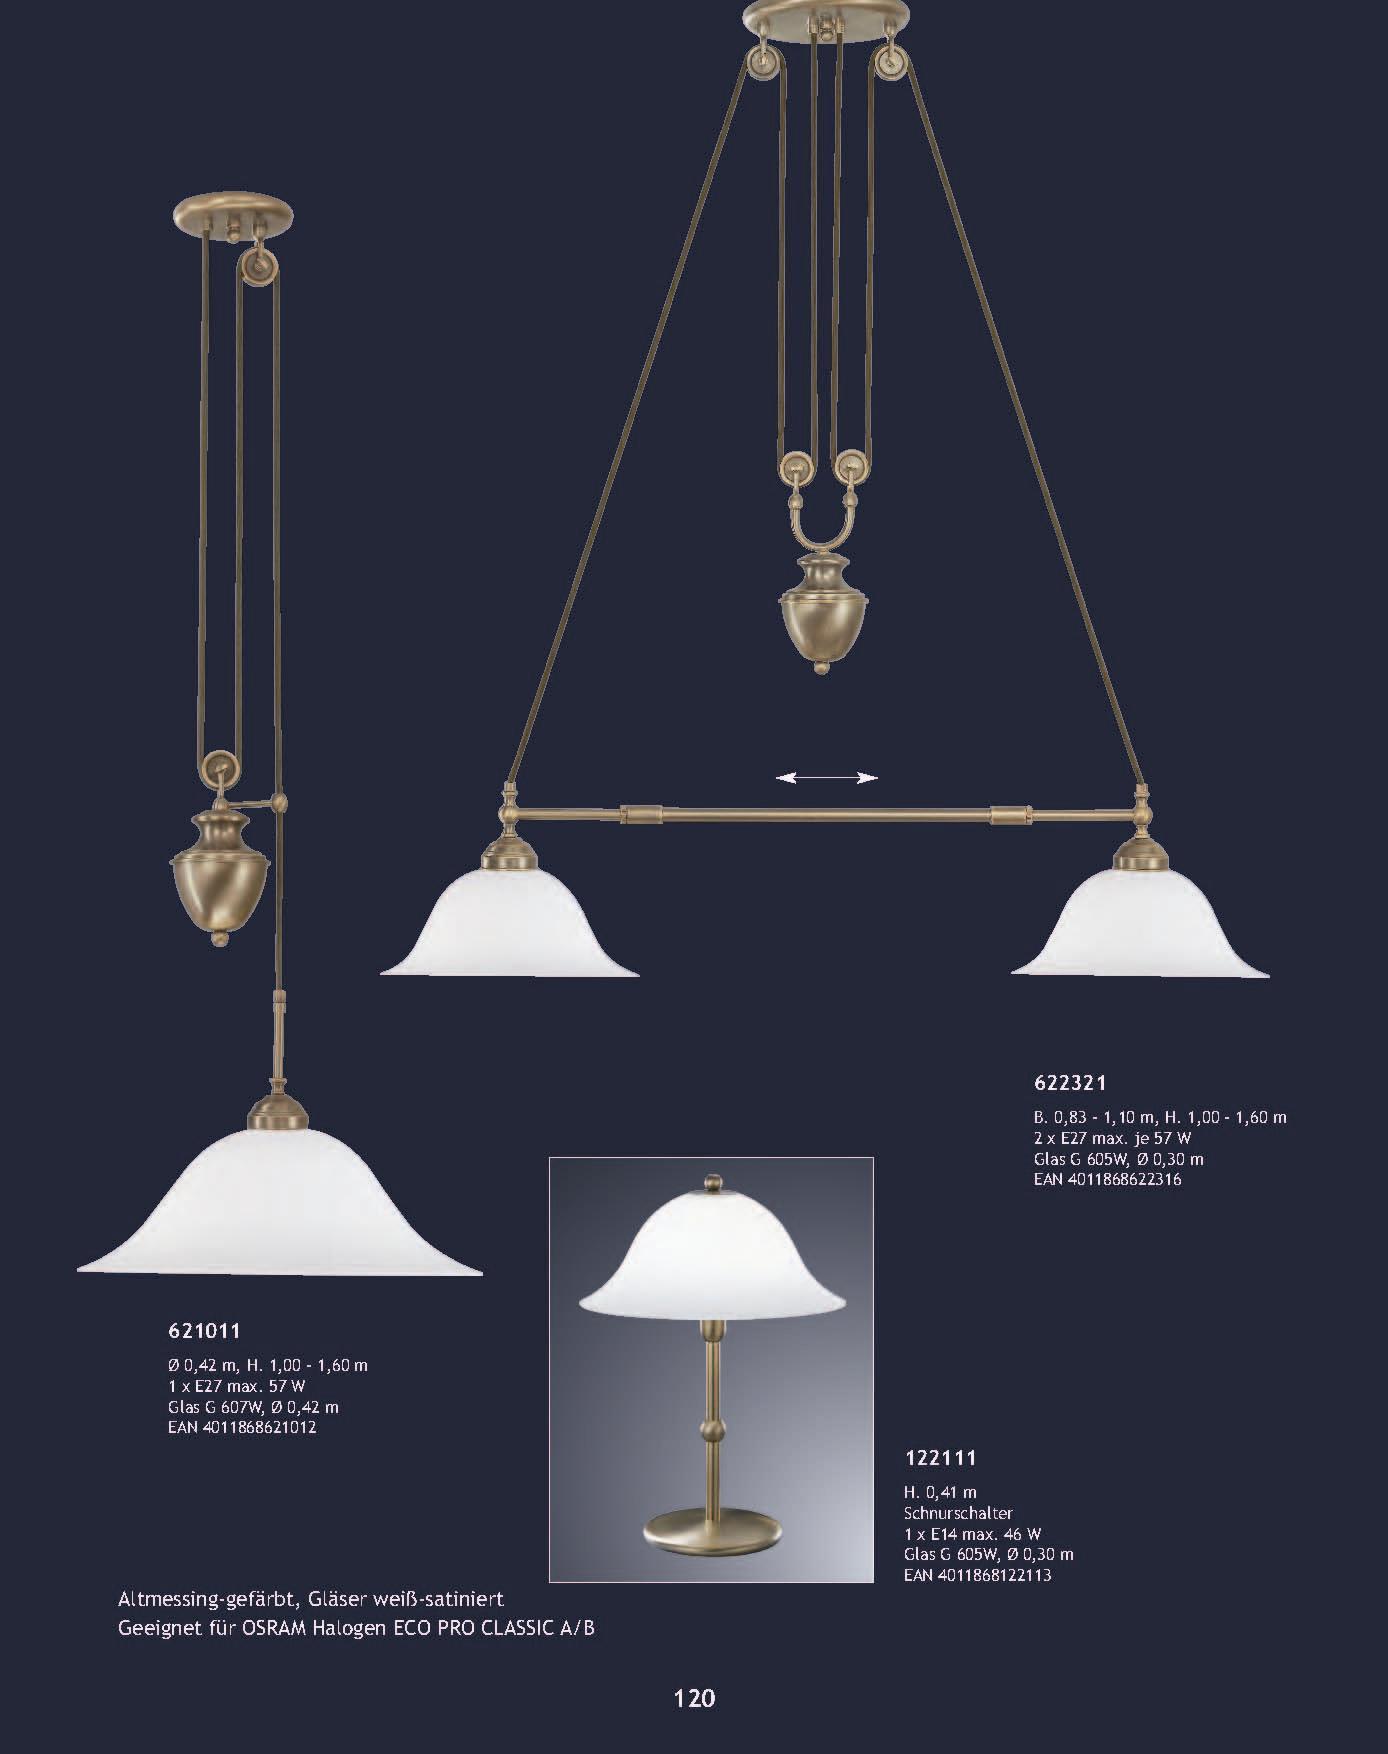 hufnagel leuchten 2013年现代灯饰设计素材_礼品设计图片